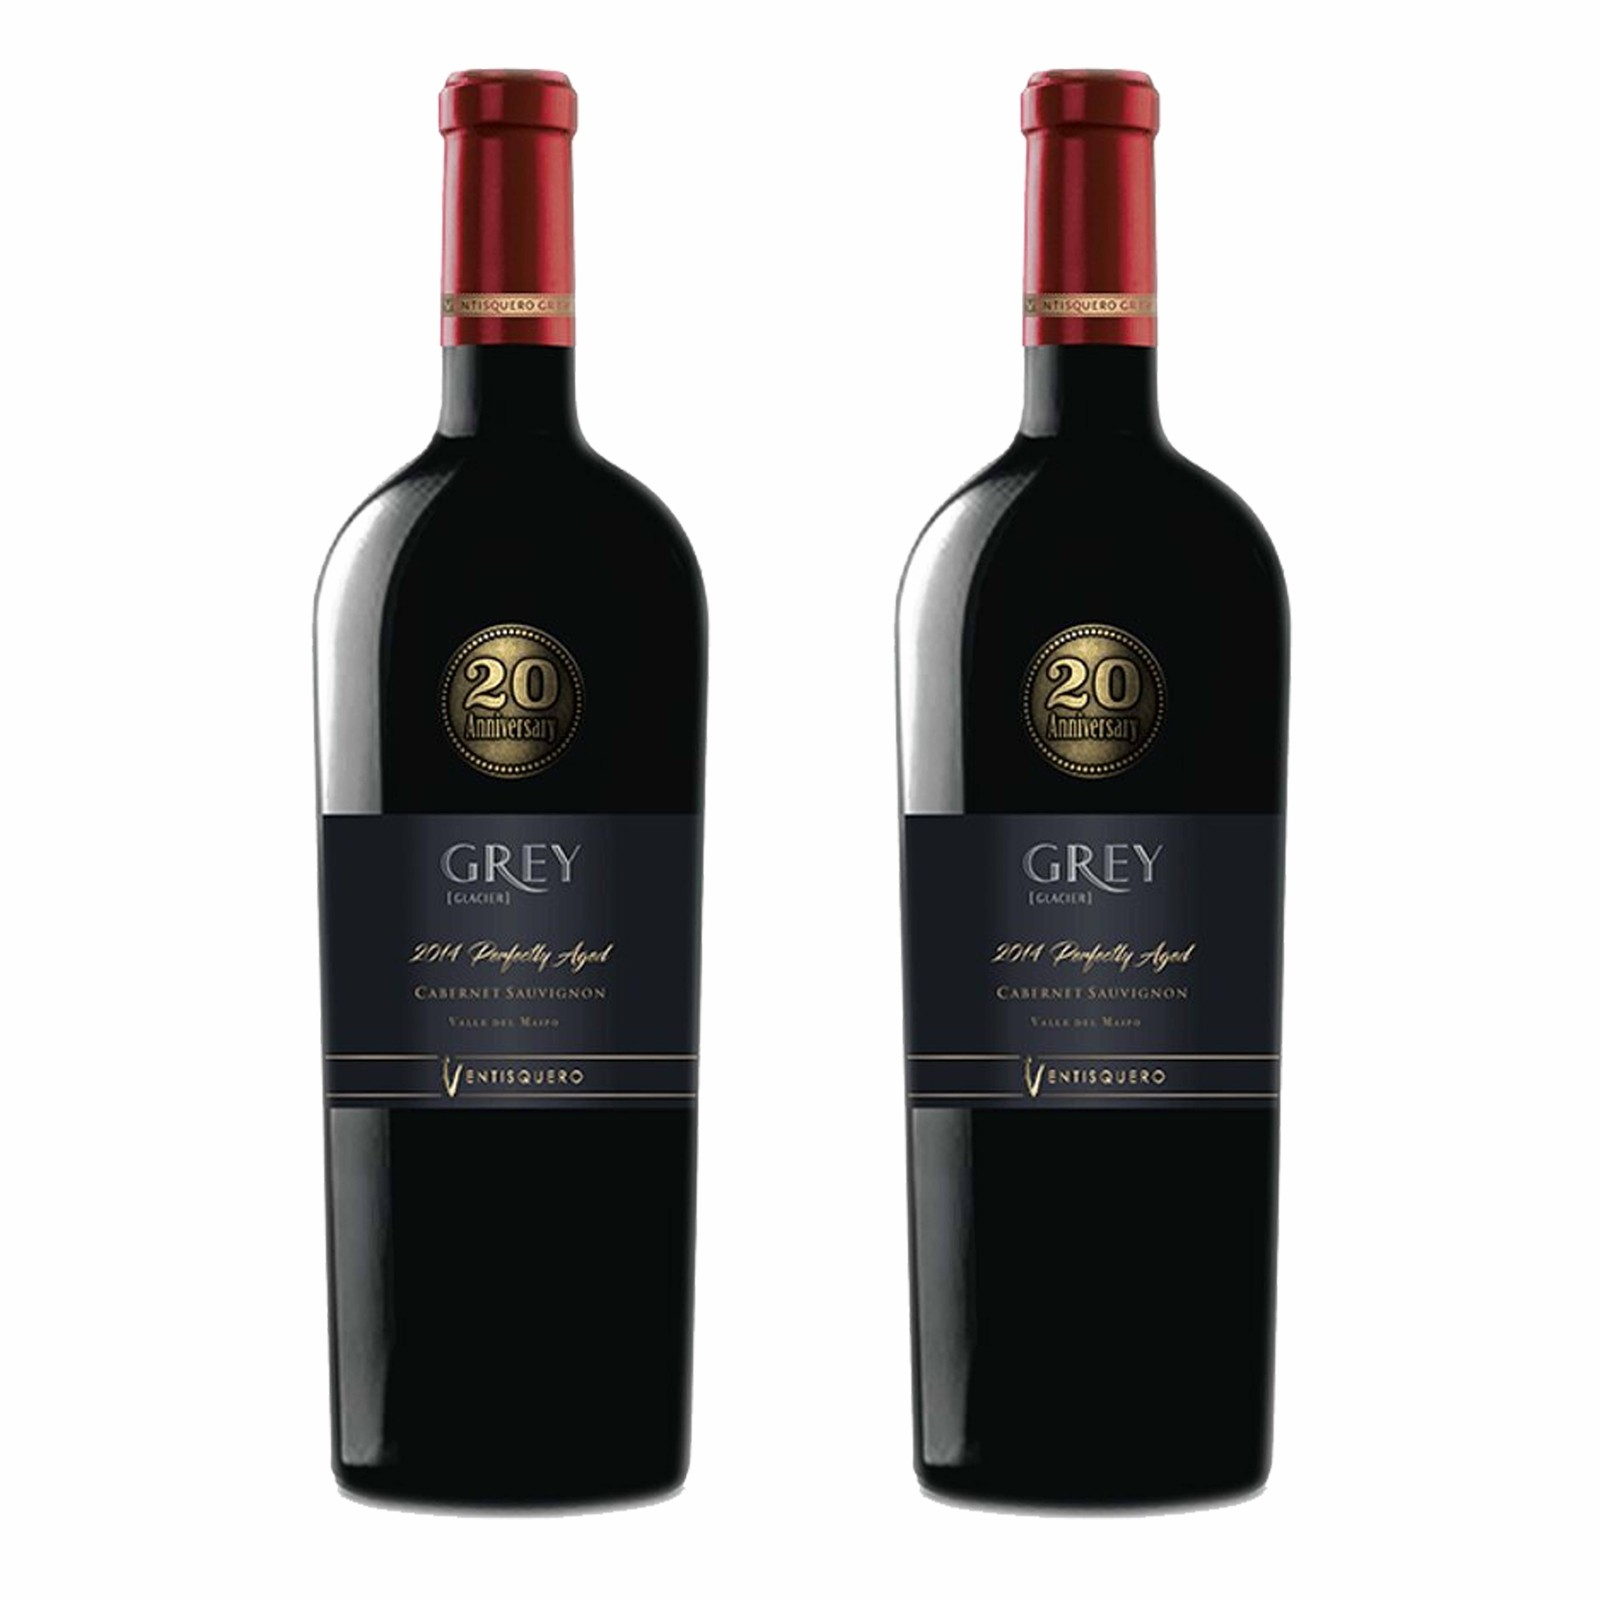 Kit 2x Vinho Tinto Chileno Ventisquero Grey Special Edition Cabernet Sauvignon 2014 750ml